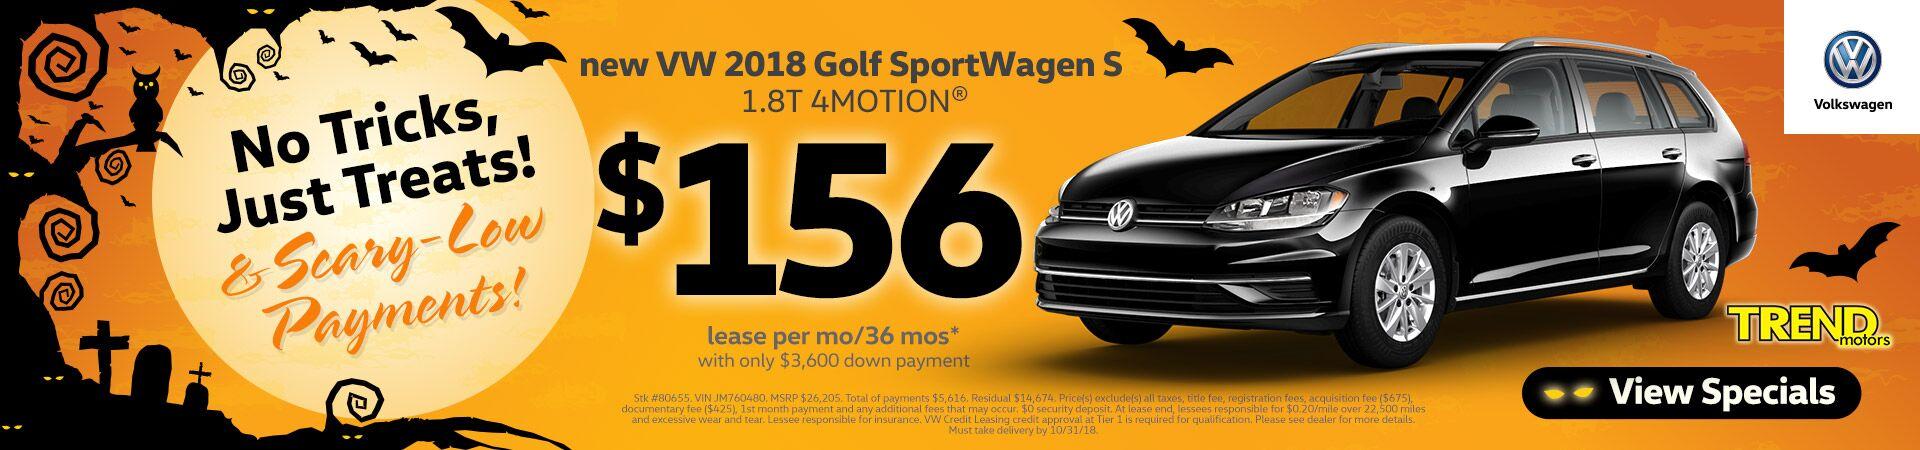 2018 vw golf sportwagen - 46 Automotive Cv Effortless